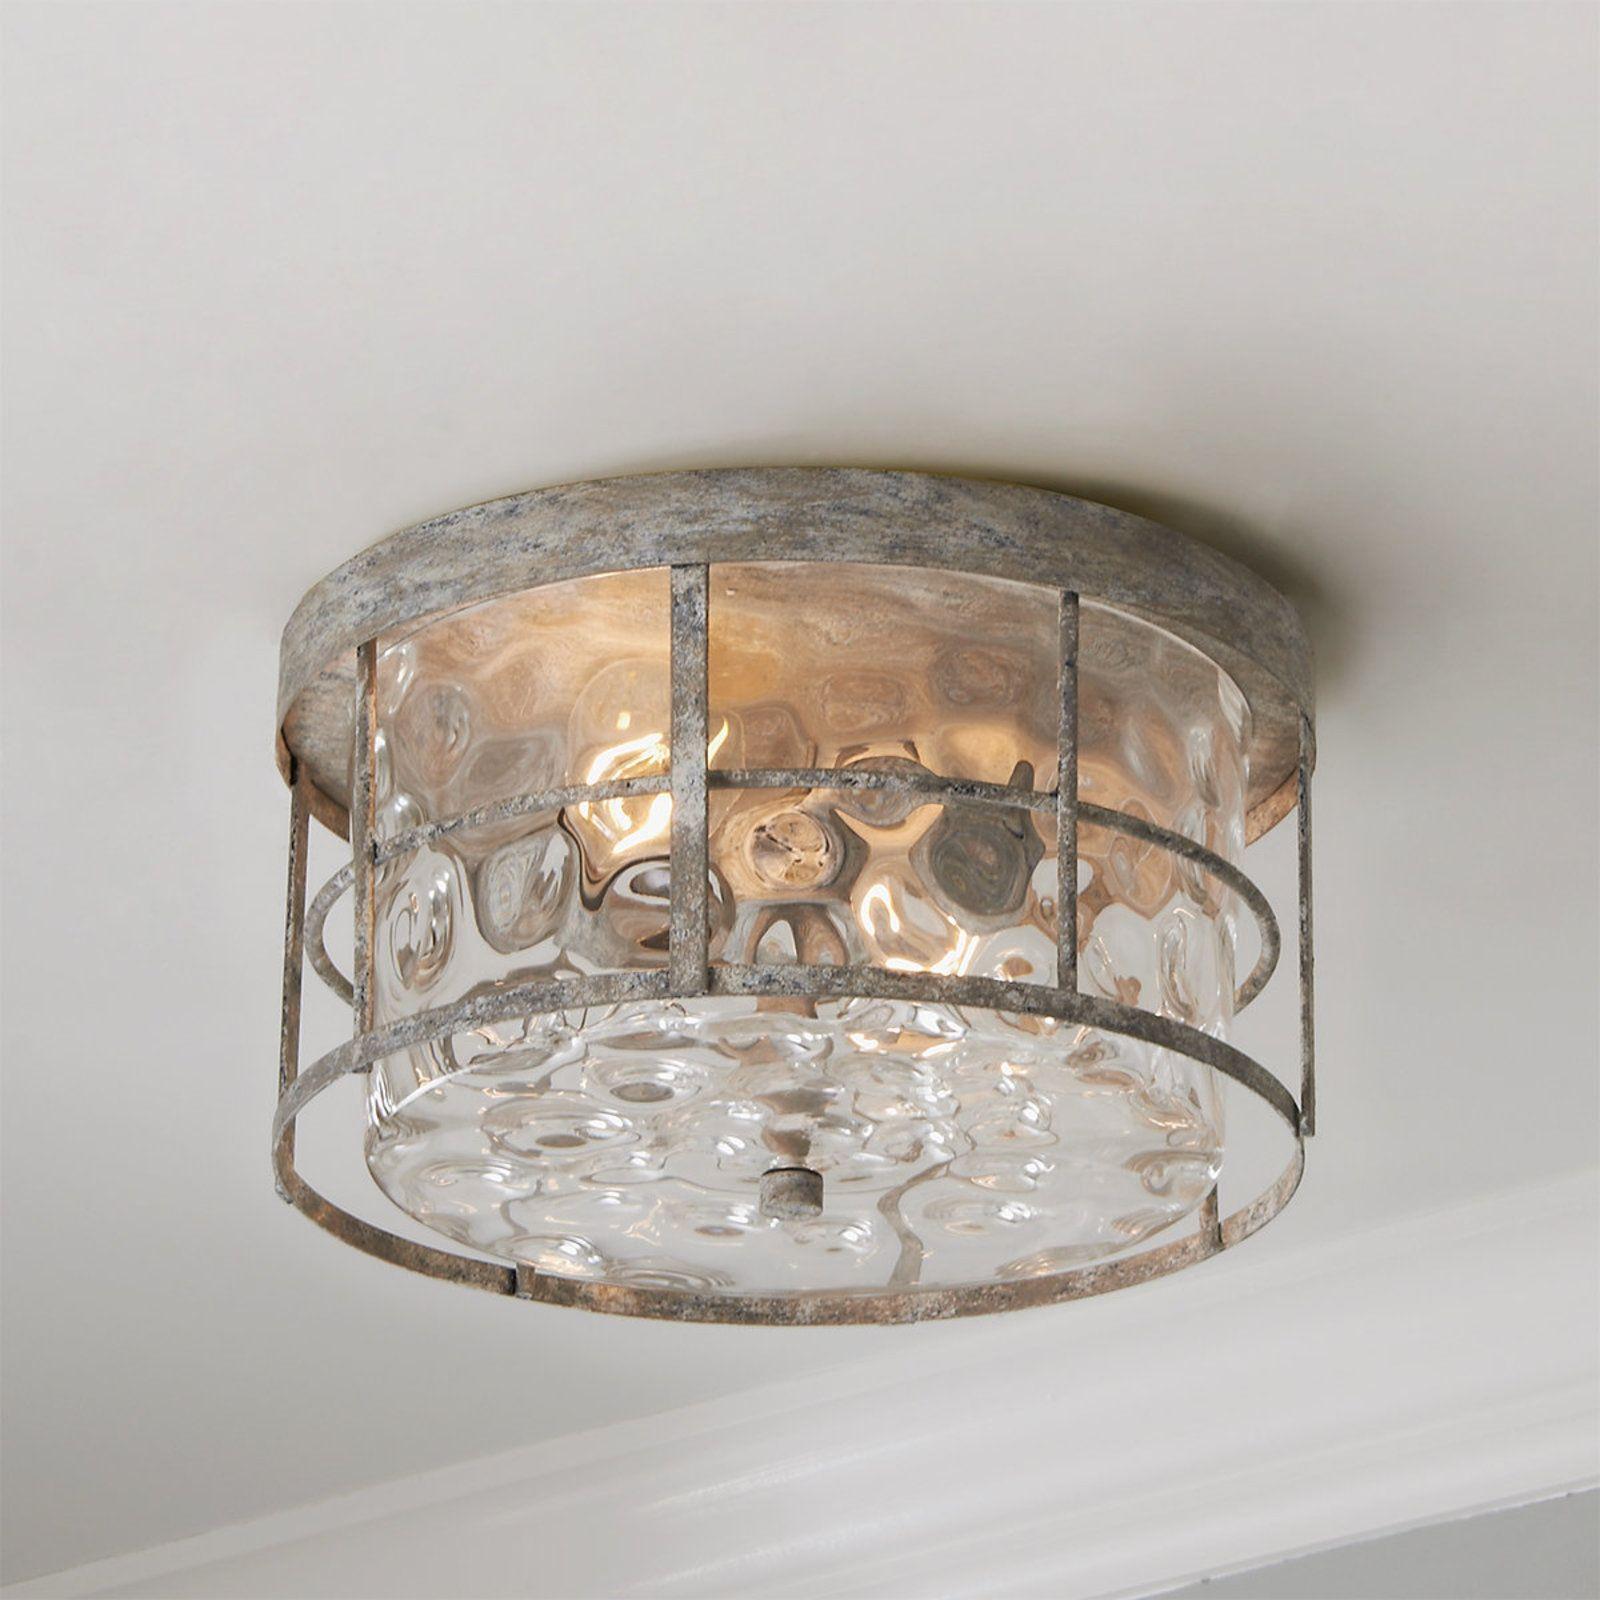 Coastal Cottage Ceiling Light in 2020 Coastal light